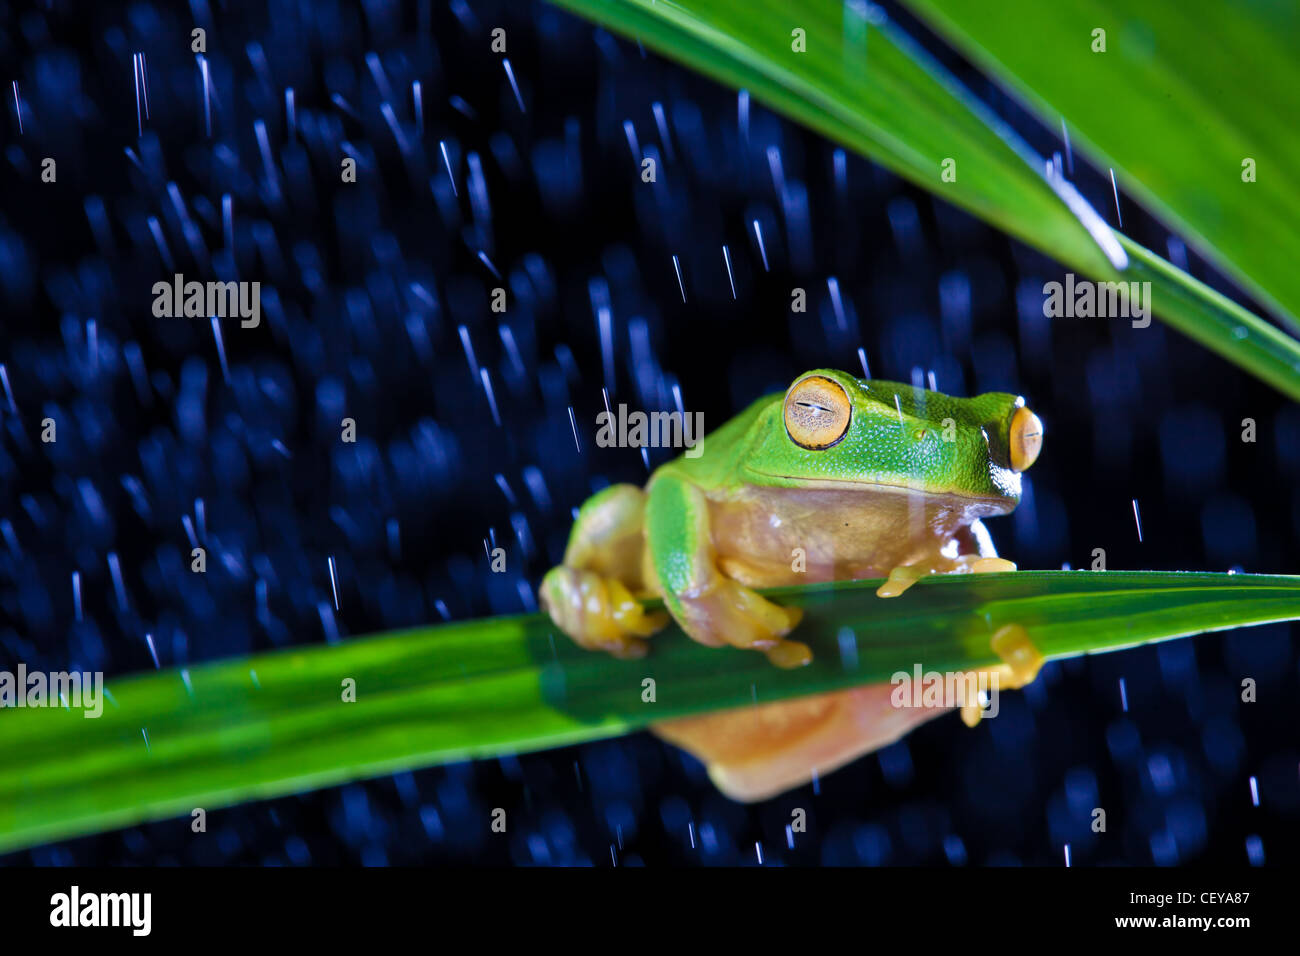 Kleinen grünen Laubfrosch auf grüne Blatt im Regen sitzen Stockbild